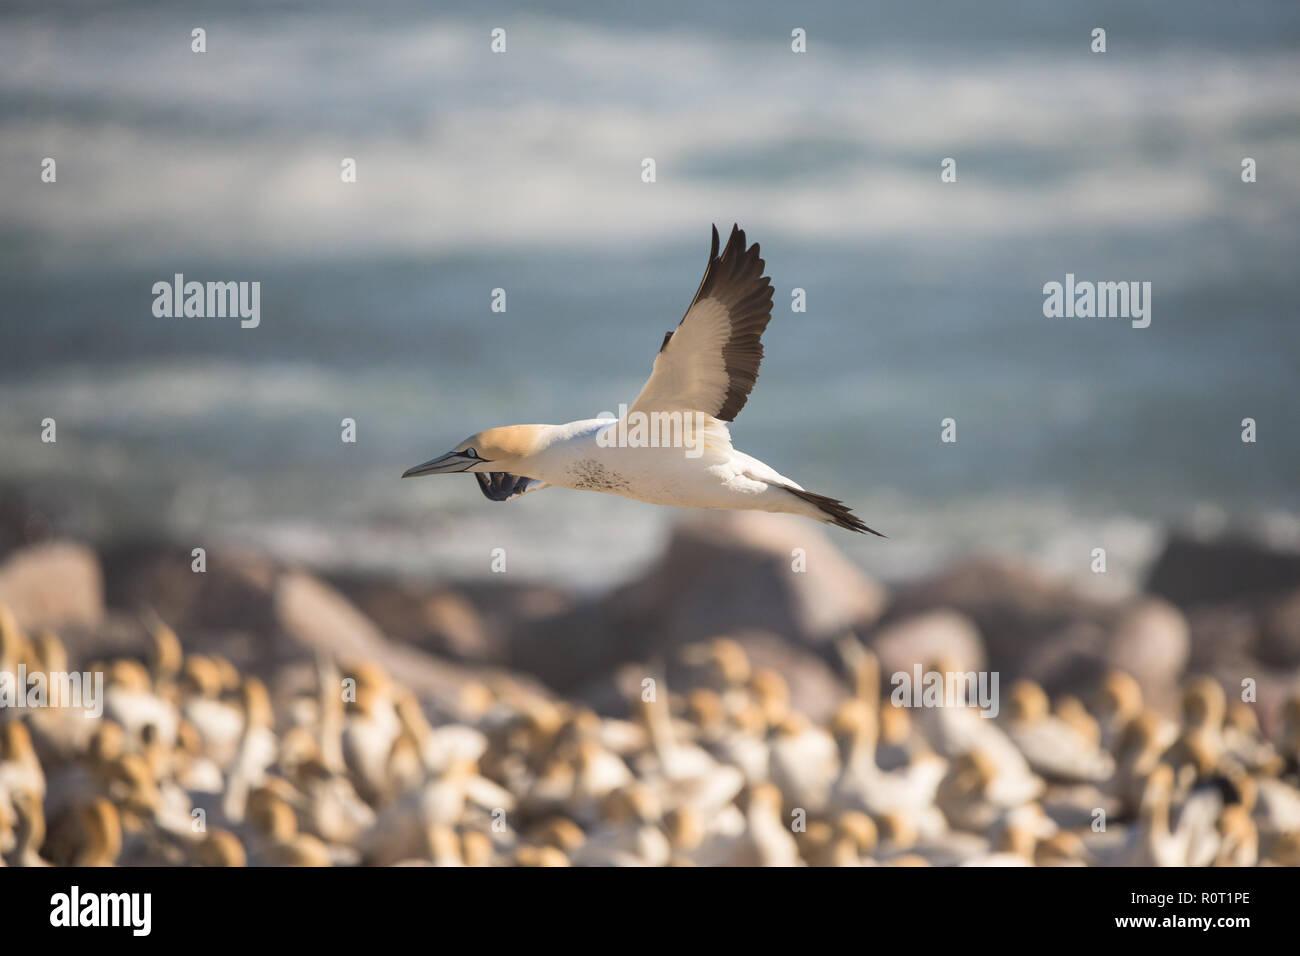 Cape Gannet bird (Morus capensis) in flight over wild bird colony Bird Island, Lamberts Bay, South Africa Stock Photo